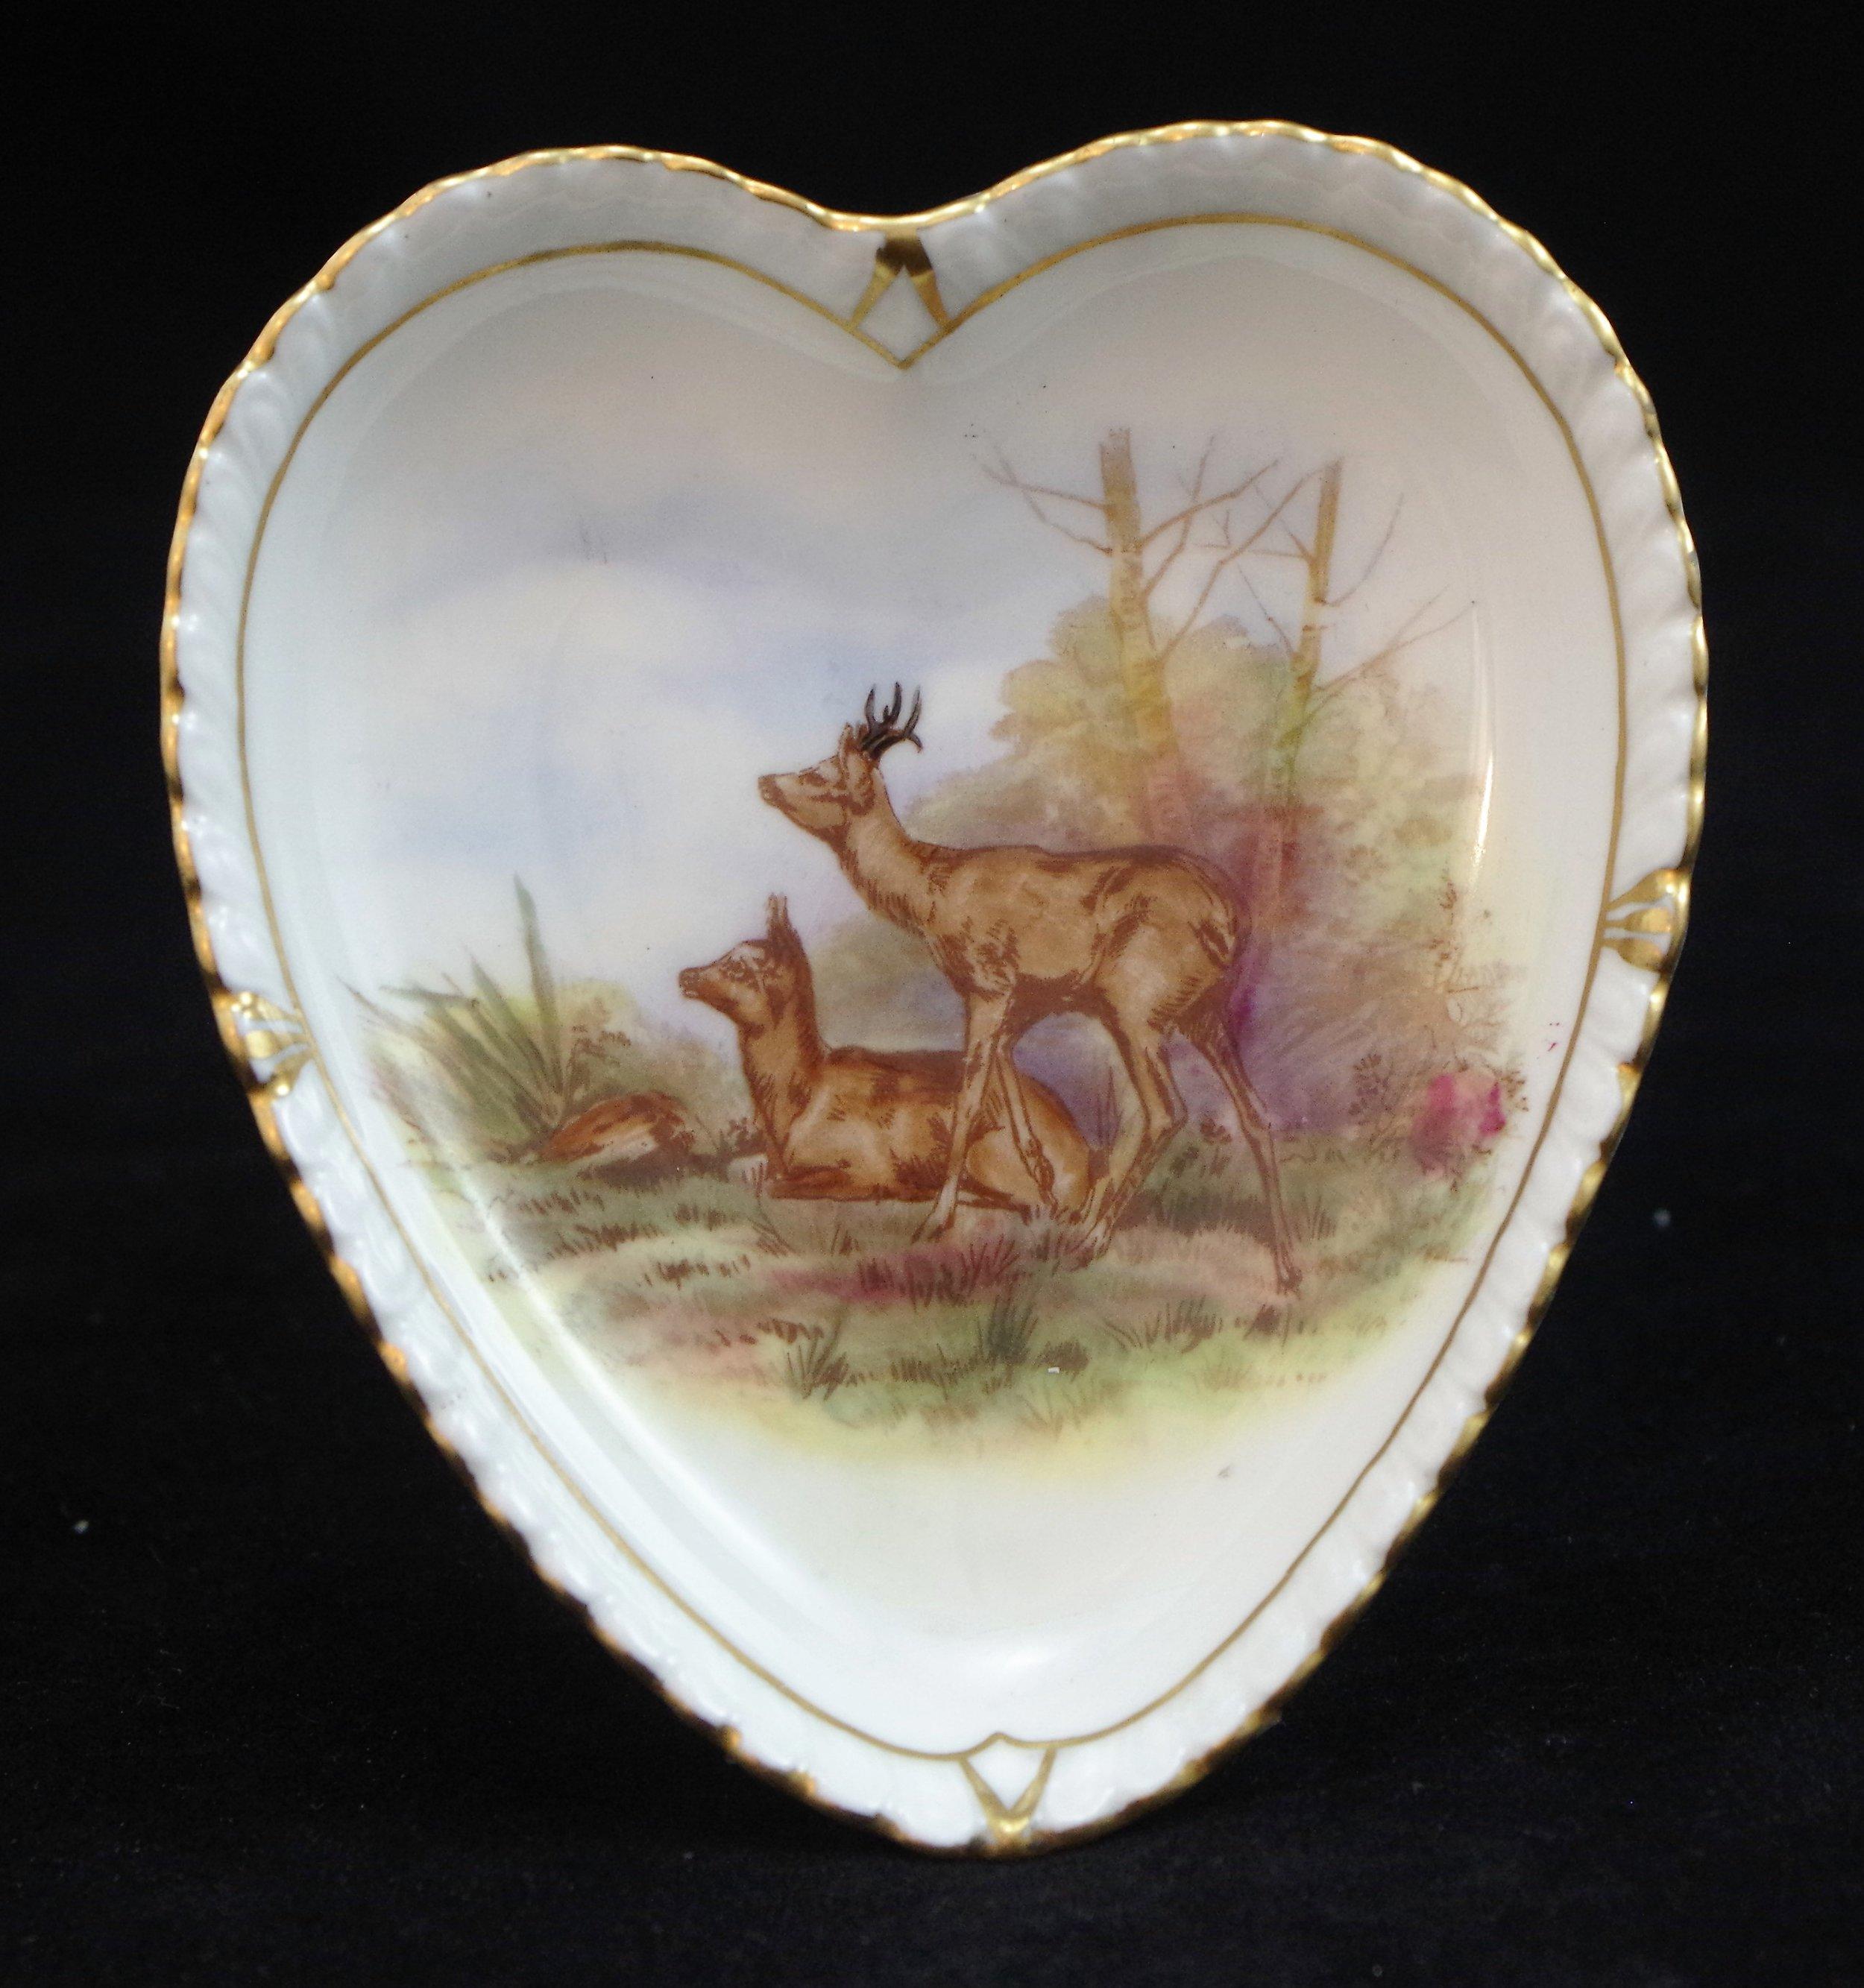 royal-crown-derby-heart-shape-gadroon-tray-deer-hunting-scene